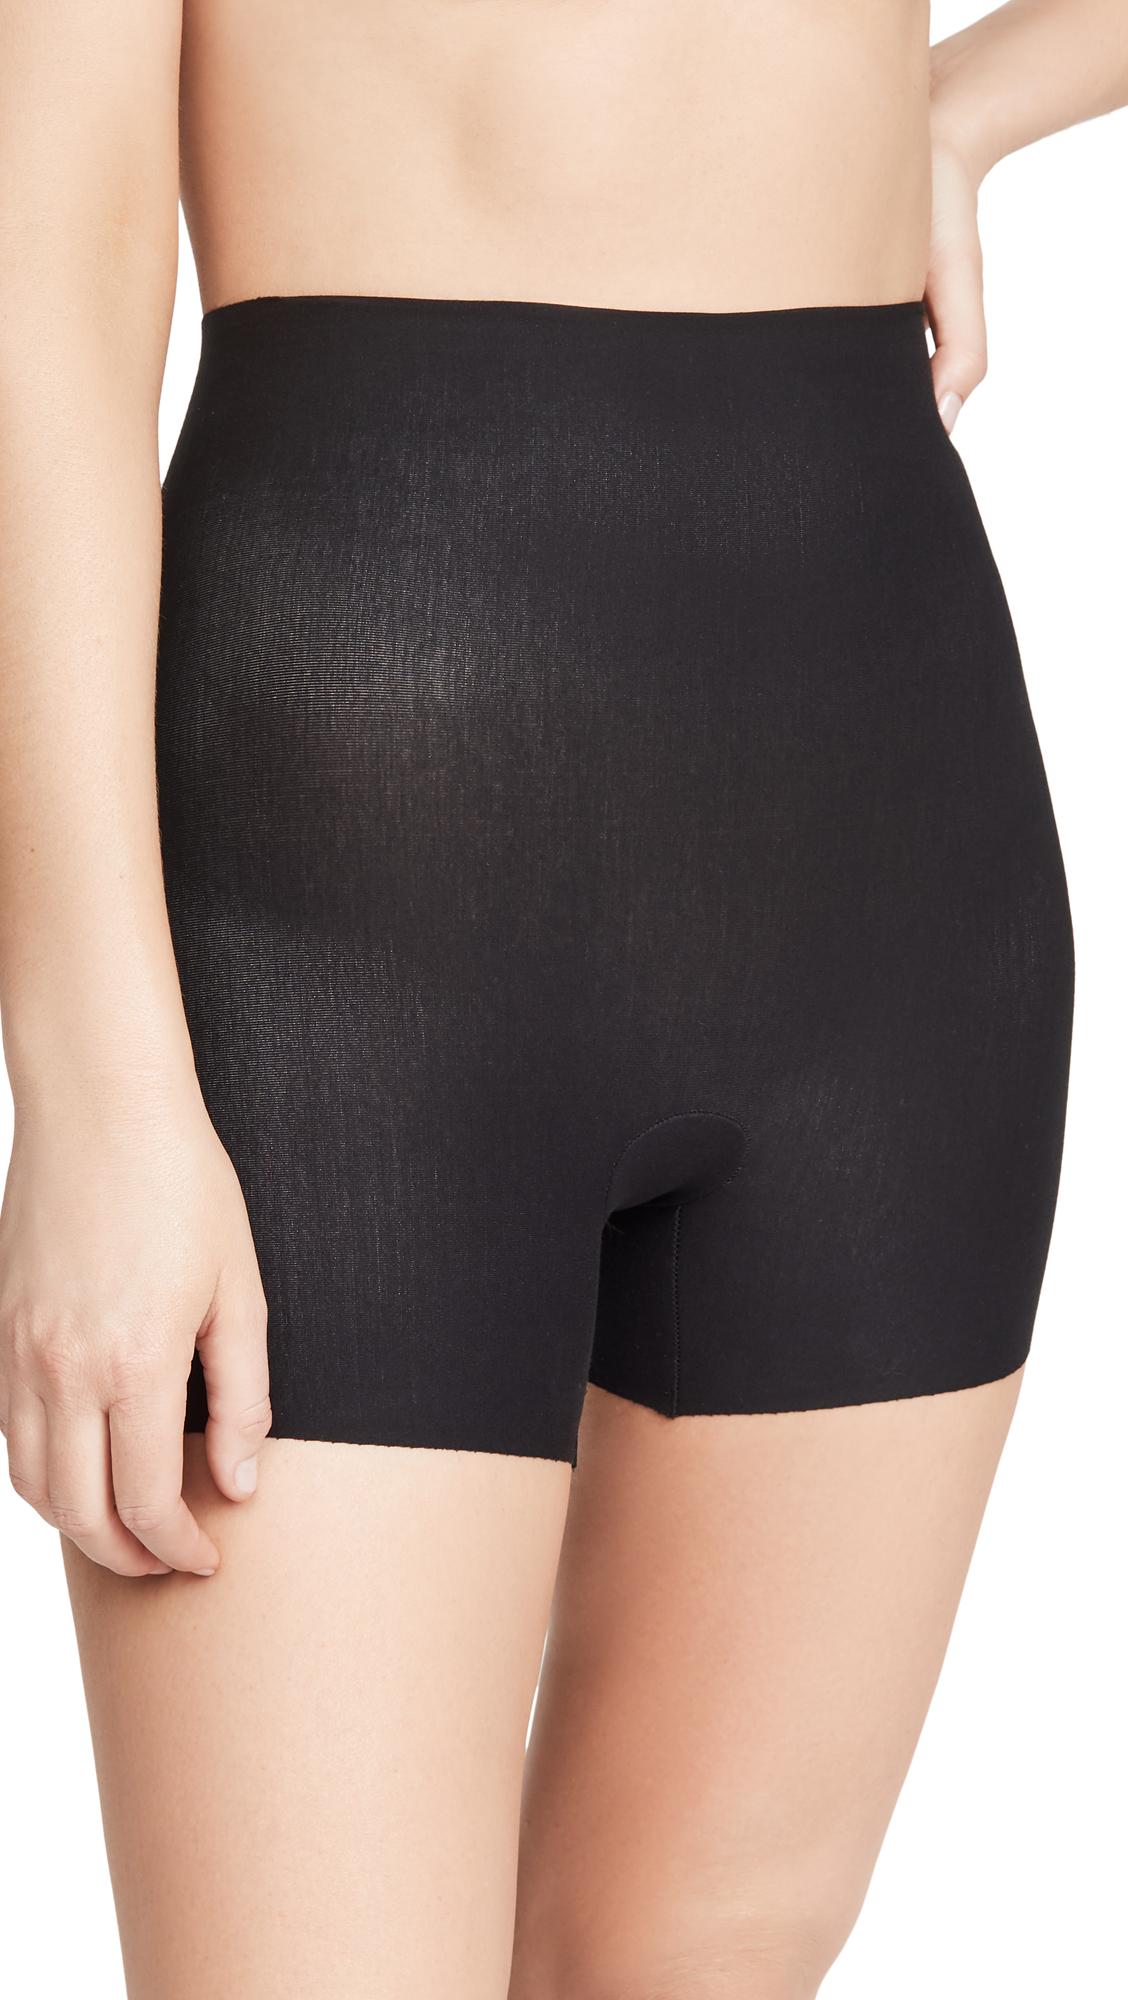 Commando Cotton Control Shortie Shorts